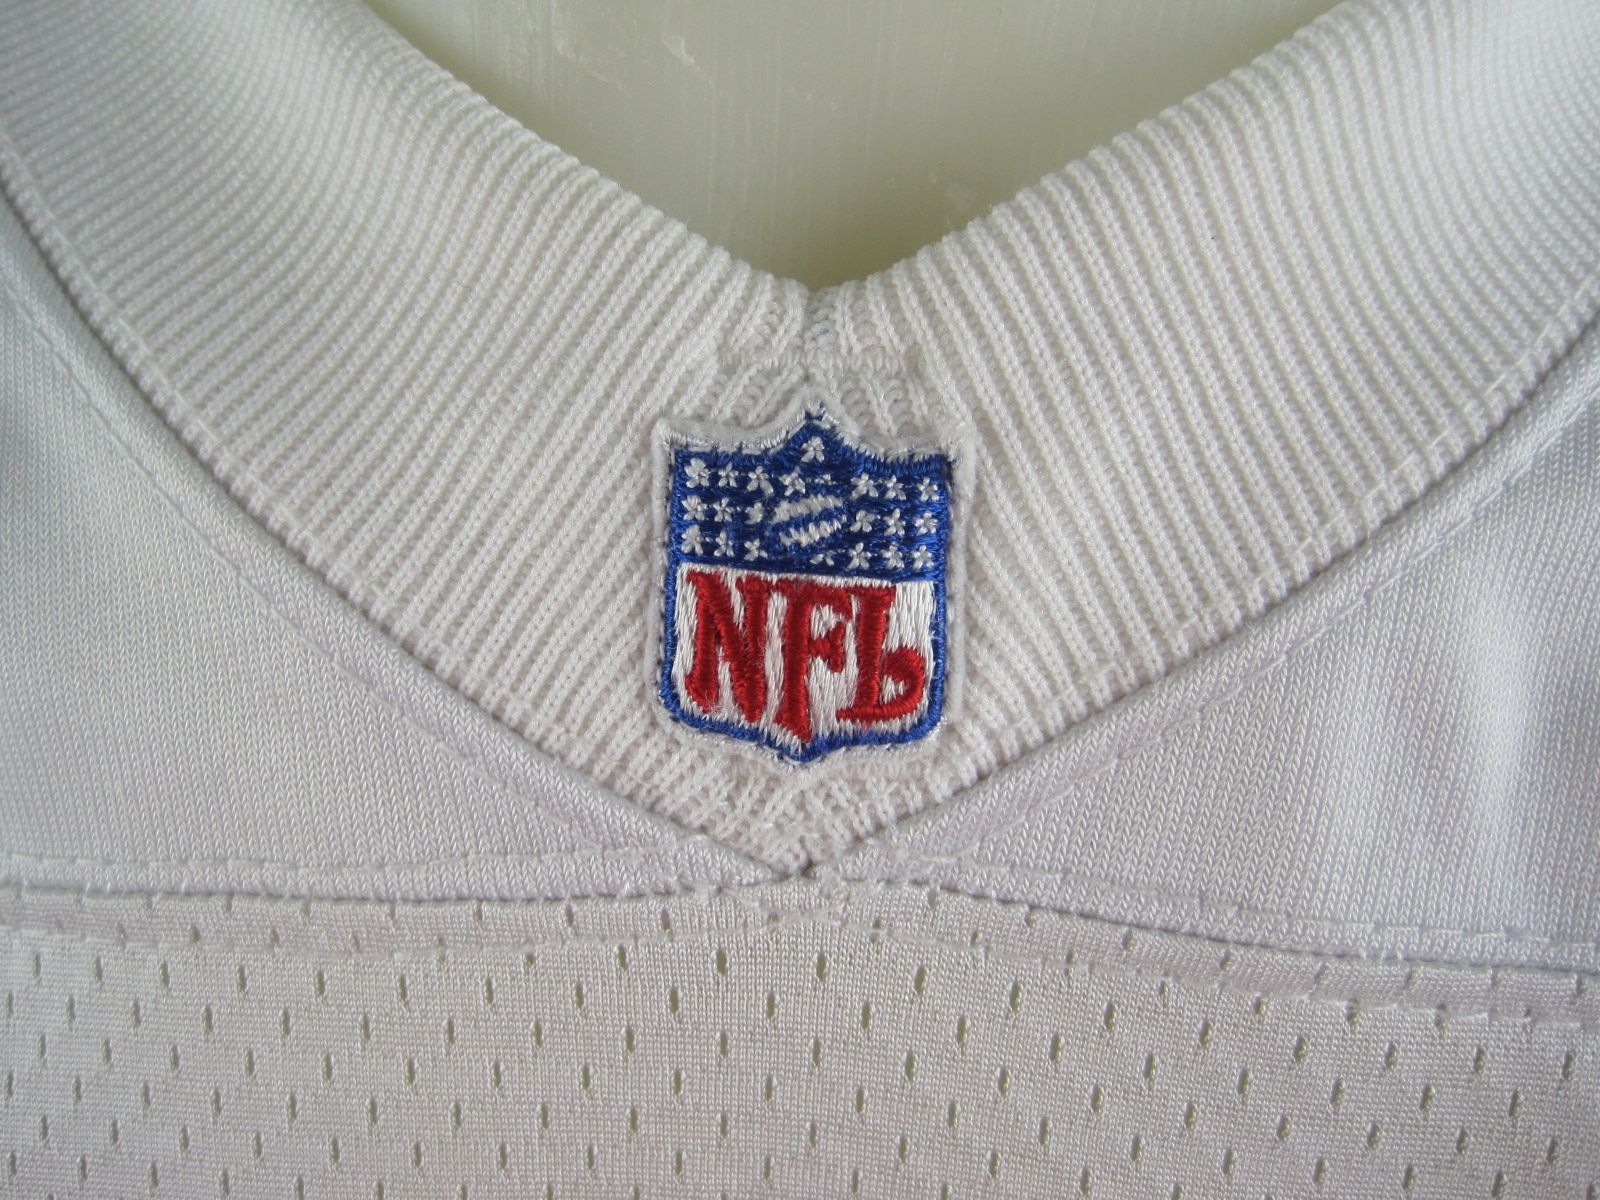 ... Emmitt Smith 1994 Dallas Cowboys NFL 75th Anniversary Professional  Model Jersey w No Use 62a46ad96